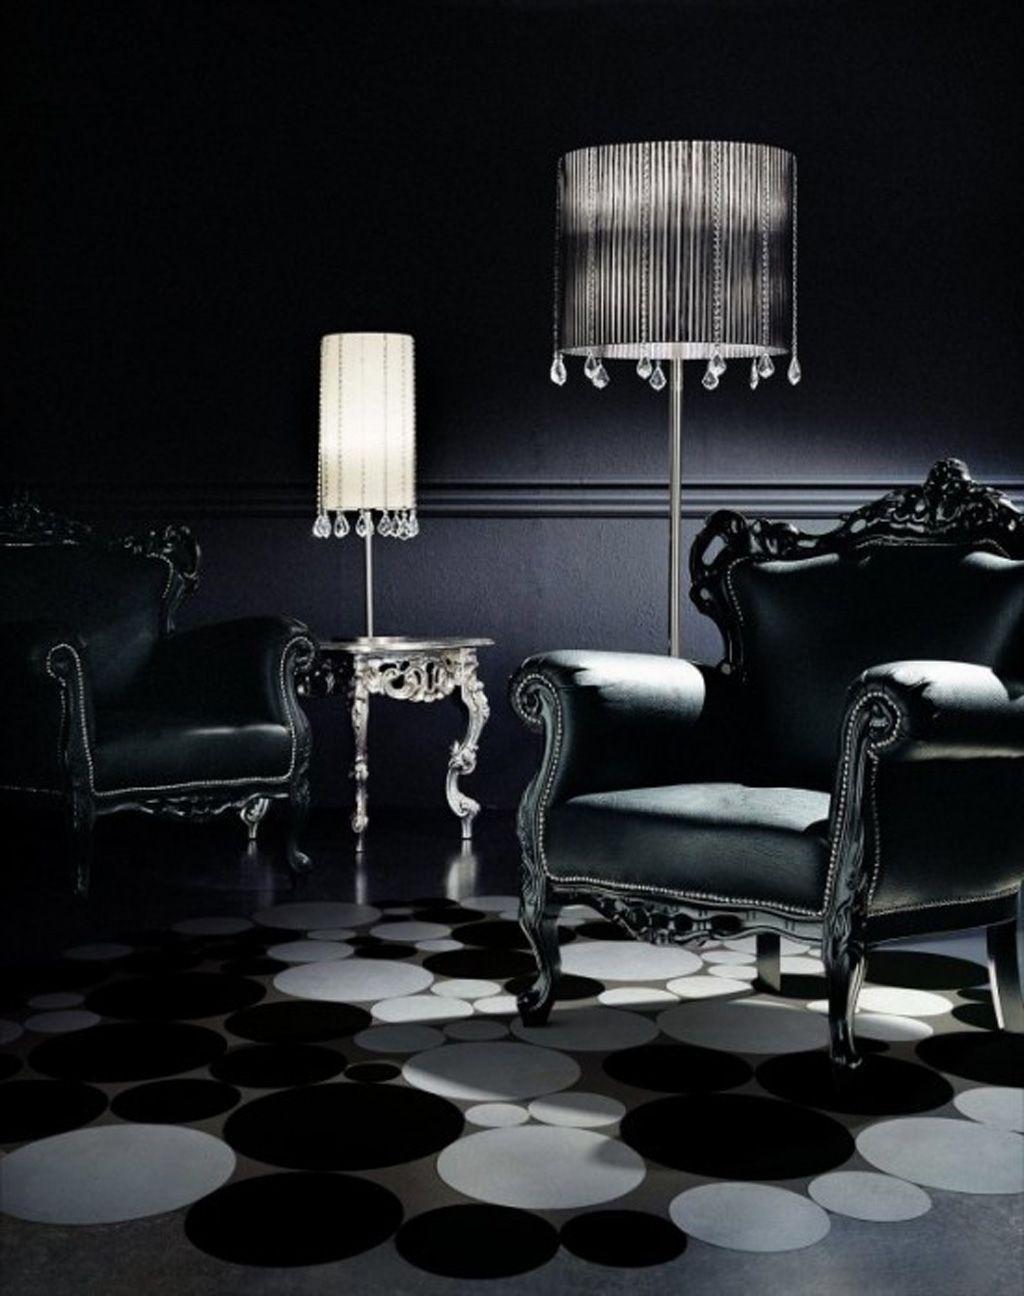 Superior Interior , Gothic Interior Design For Dark But Attractive Home Decor Ideas  : Black Furniture And